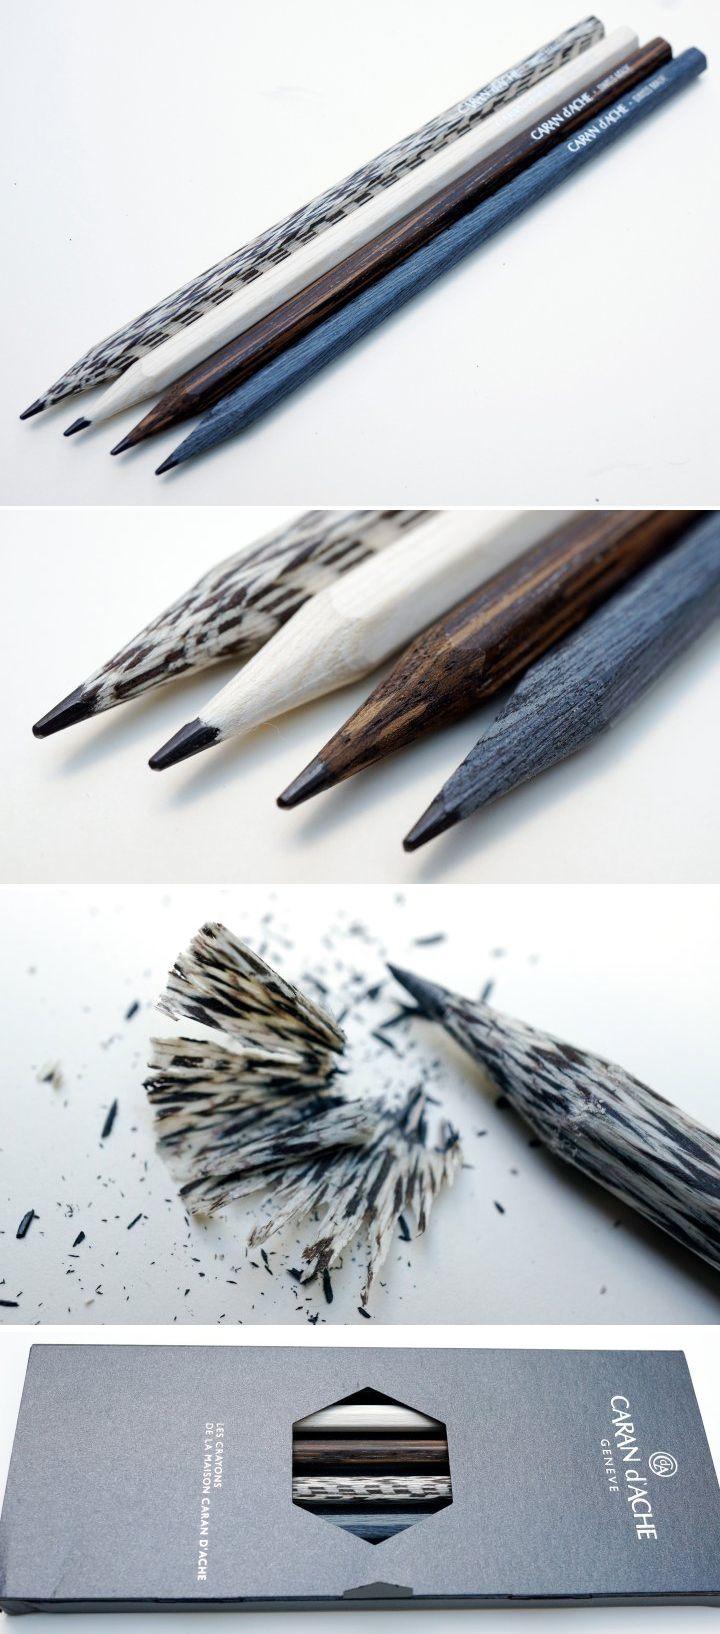 Beautiful pencils made from Titanium Oak, Macassar Ebony, Lati Gray, and American Walnut made by Les crayons de la maison Caran d'Ache